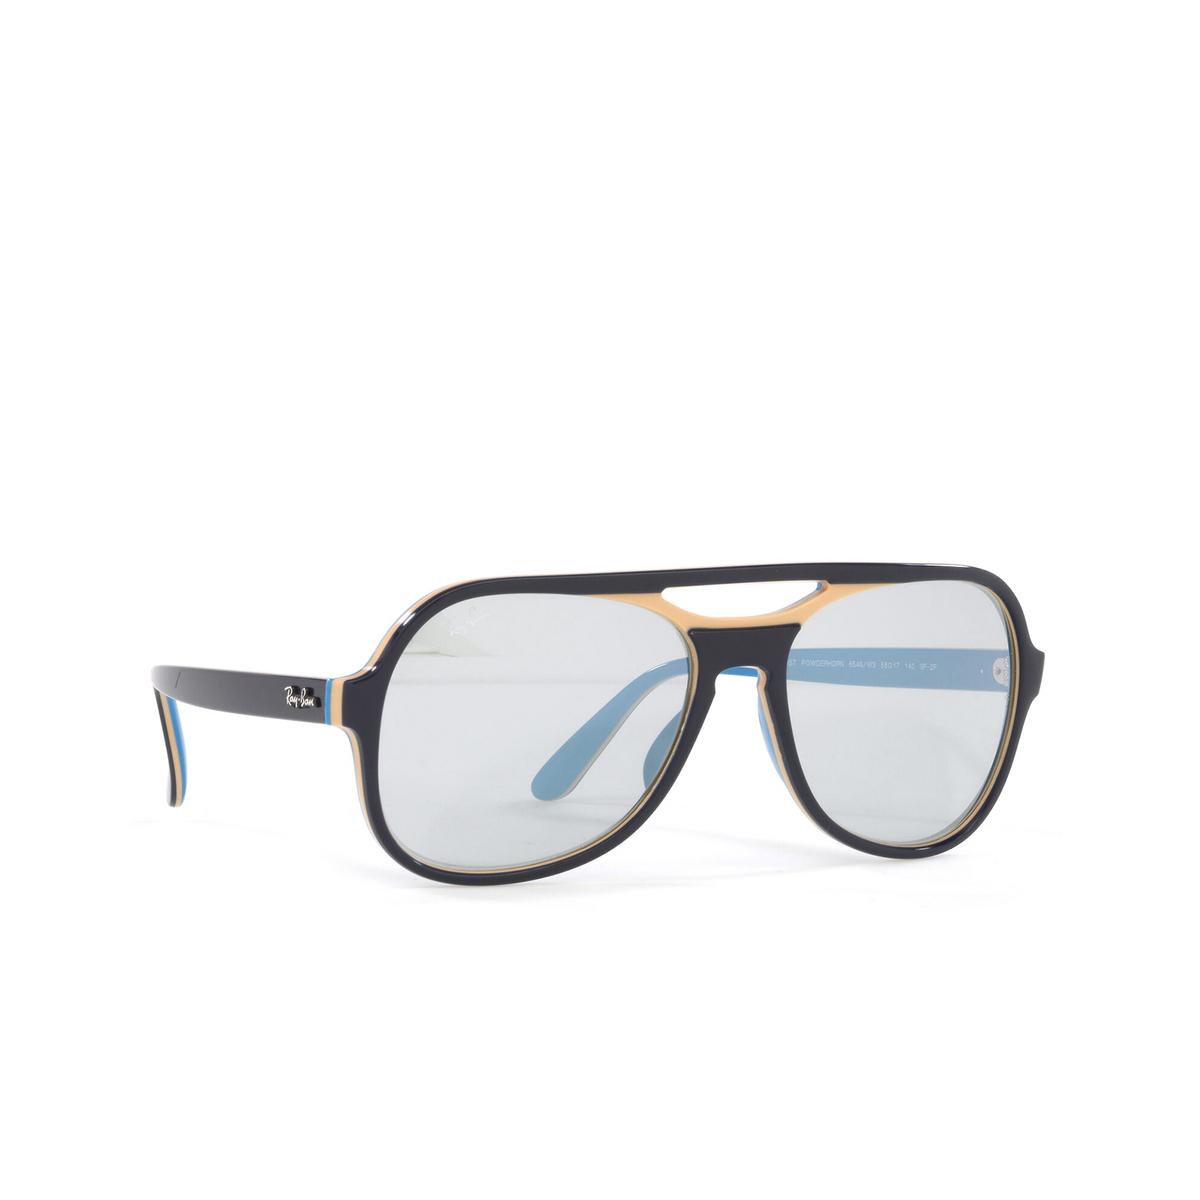 Ray-Ban® Aviator Sunglasses: Powderhorn RB4357 color Blue Creamy Light Blue 6546W3 - three-quarters view.